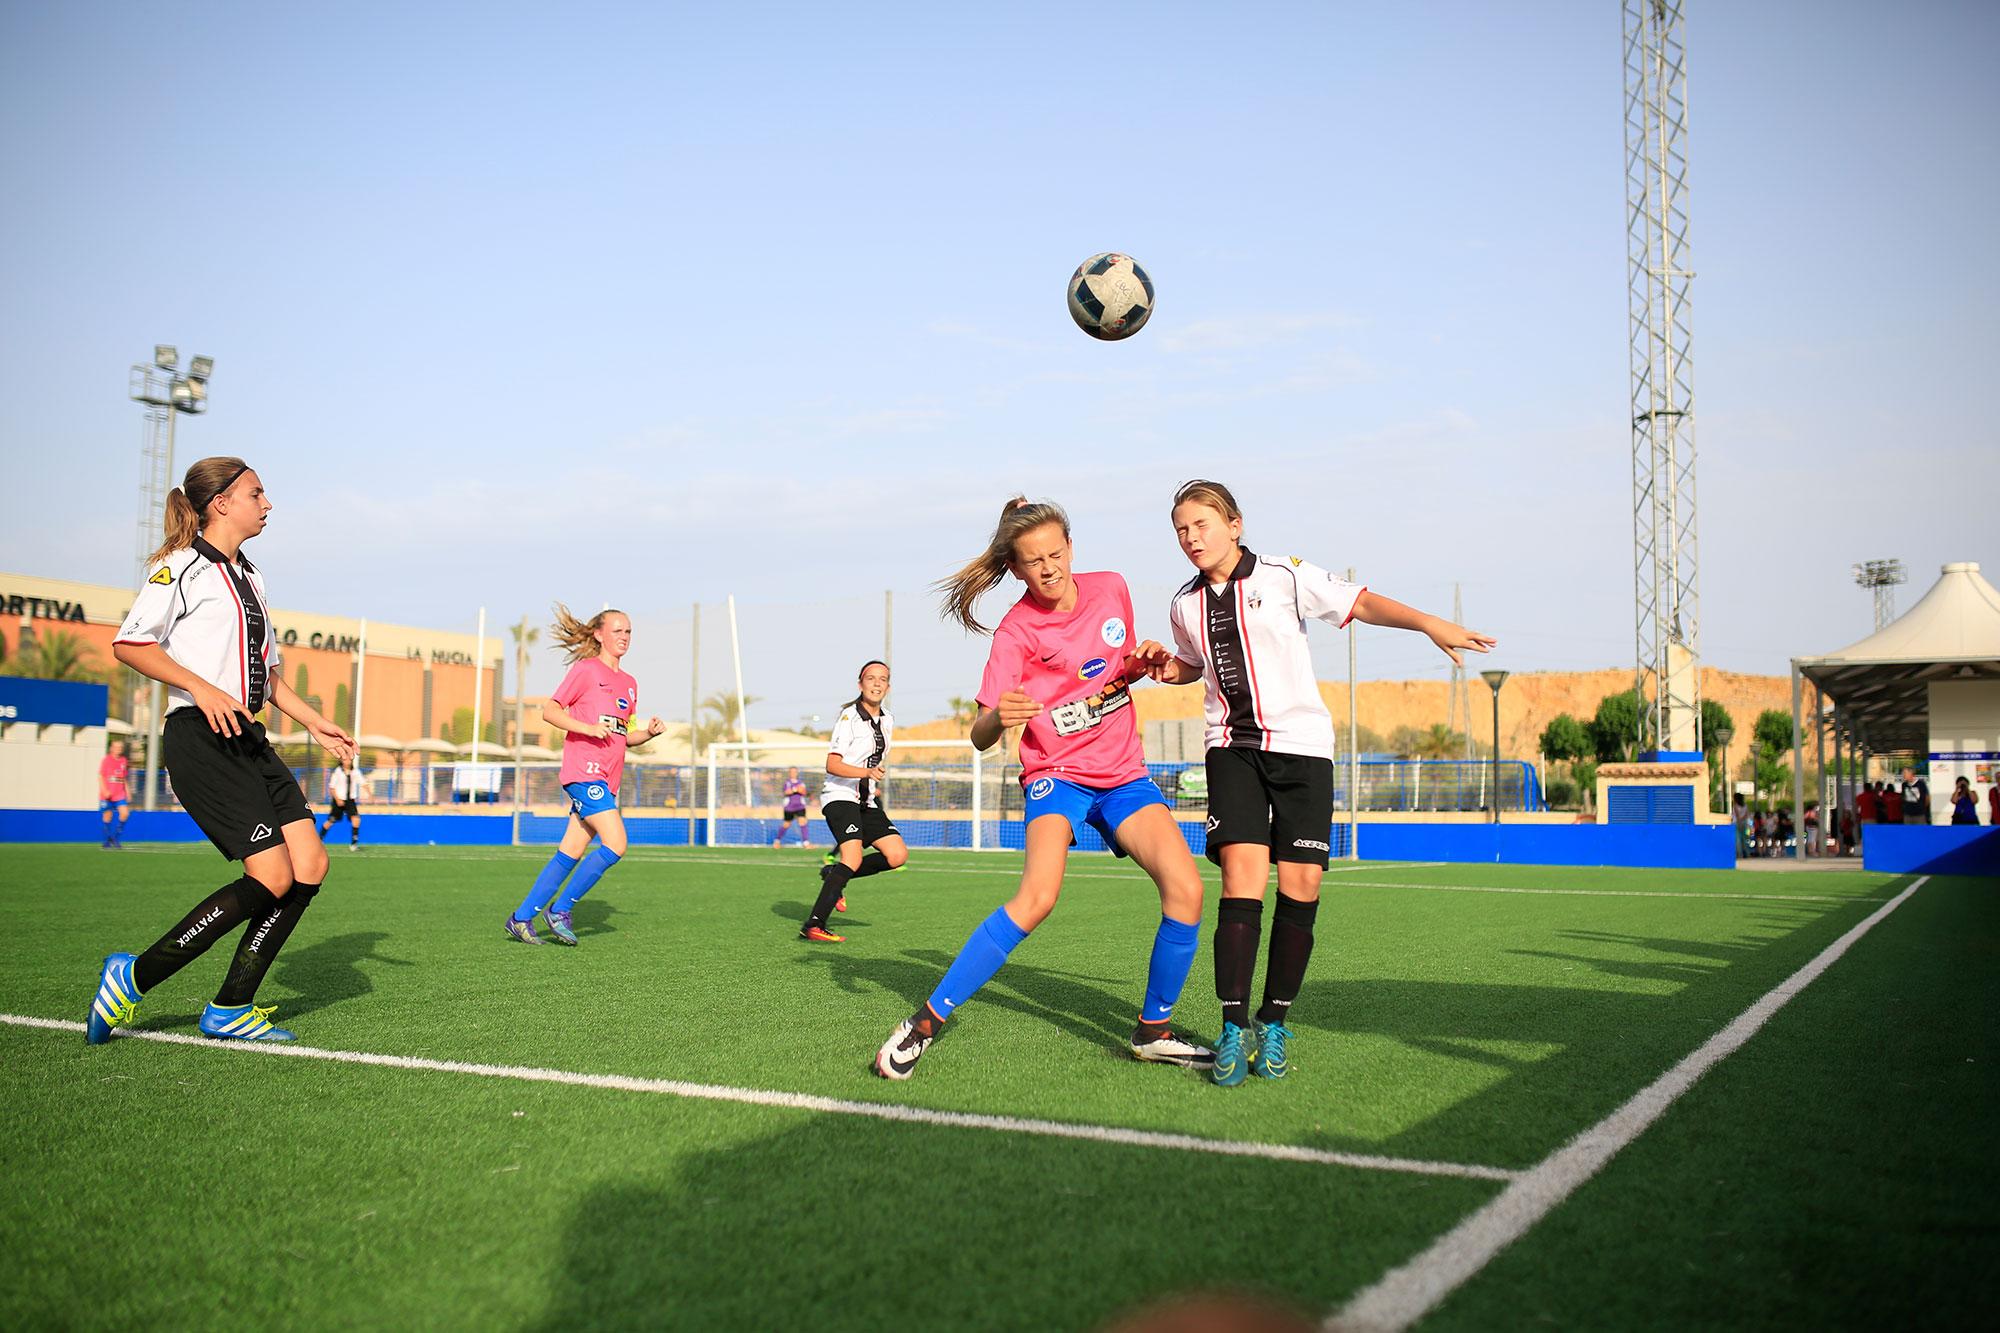 Utvalda ungdomsfotbollsturneringar 2019 i Europa